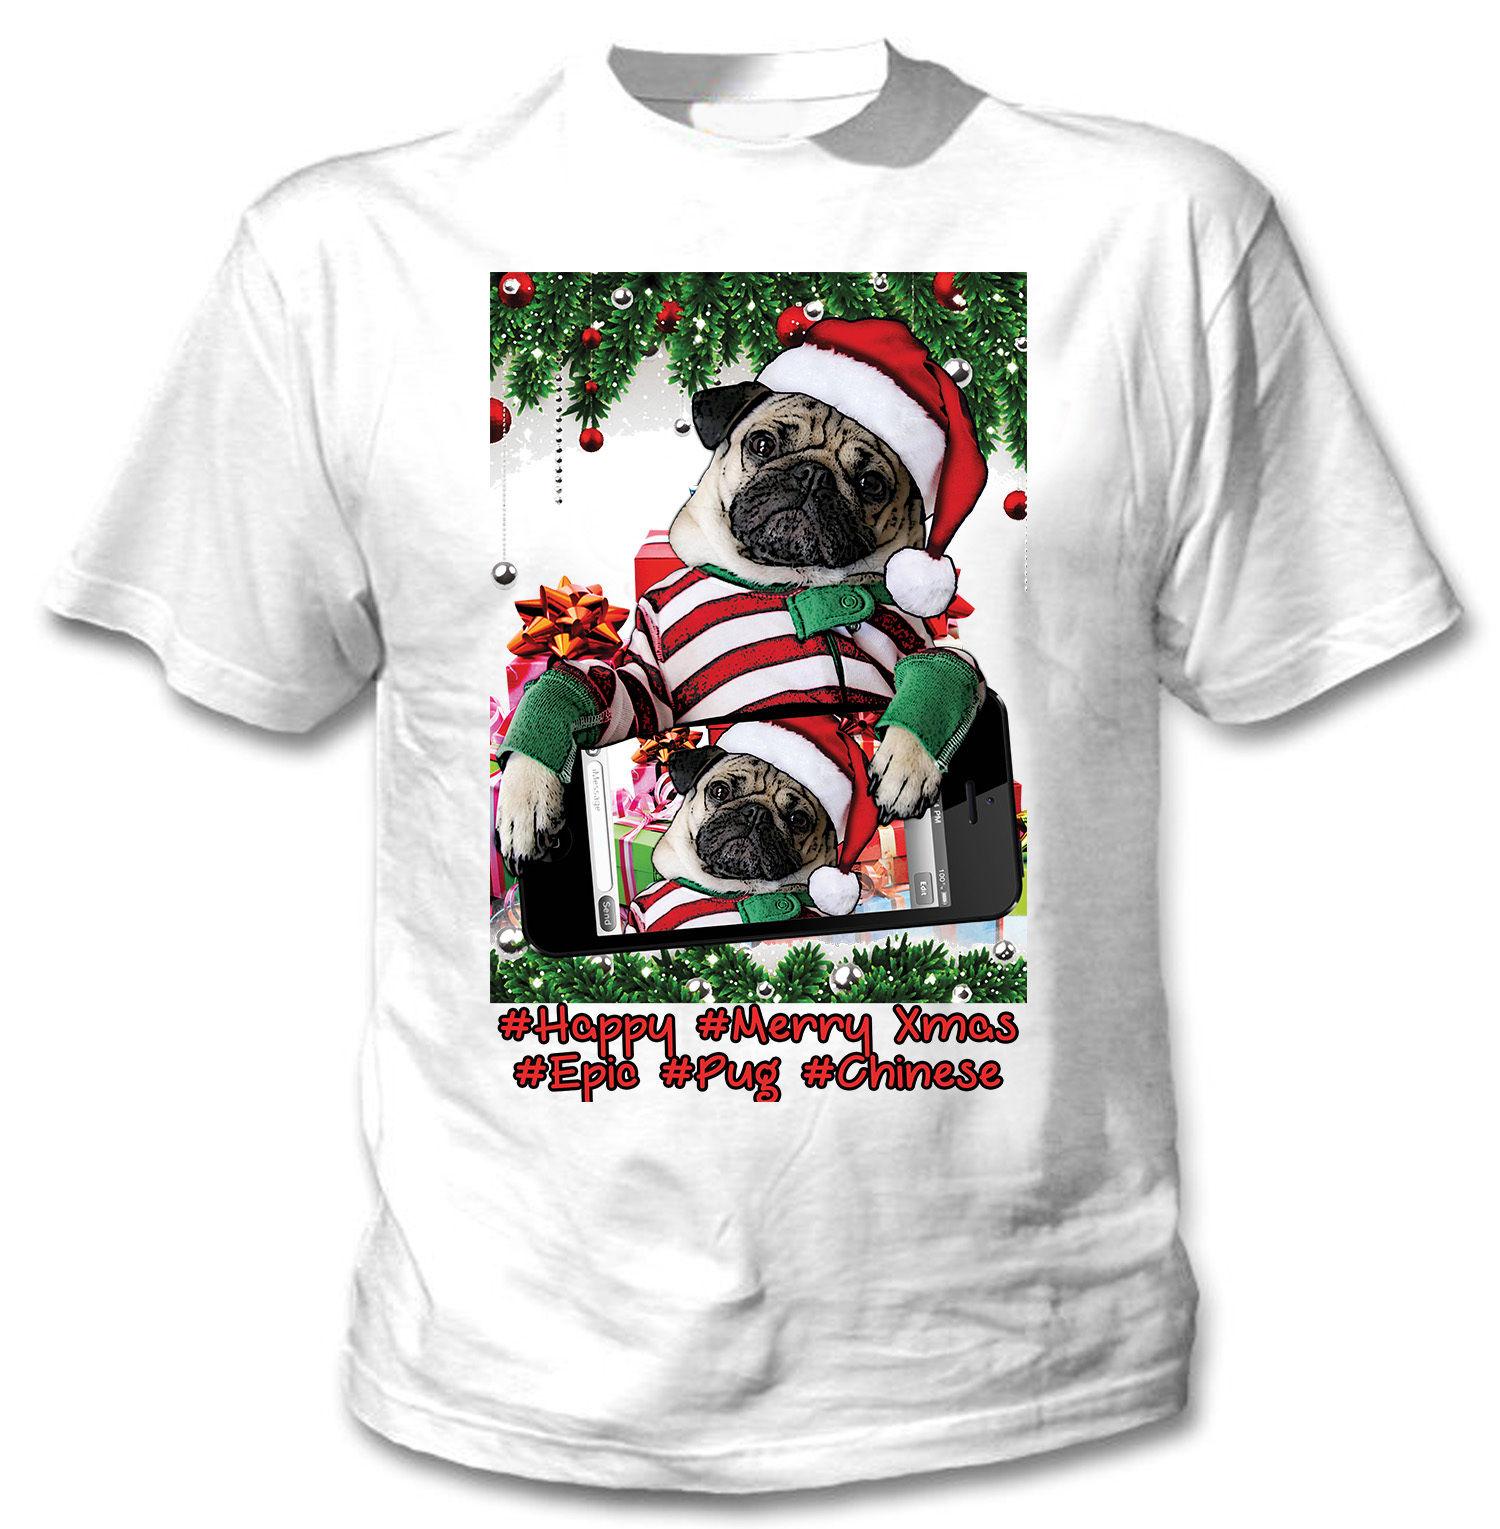 Unisex Funny Pug Selfie Christmas T Shirt I Love Pugs